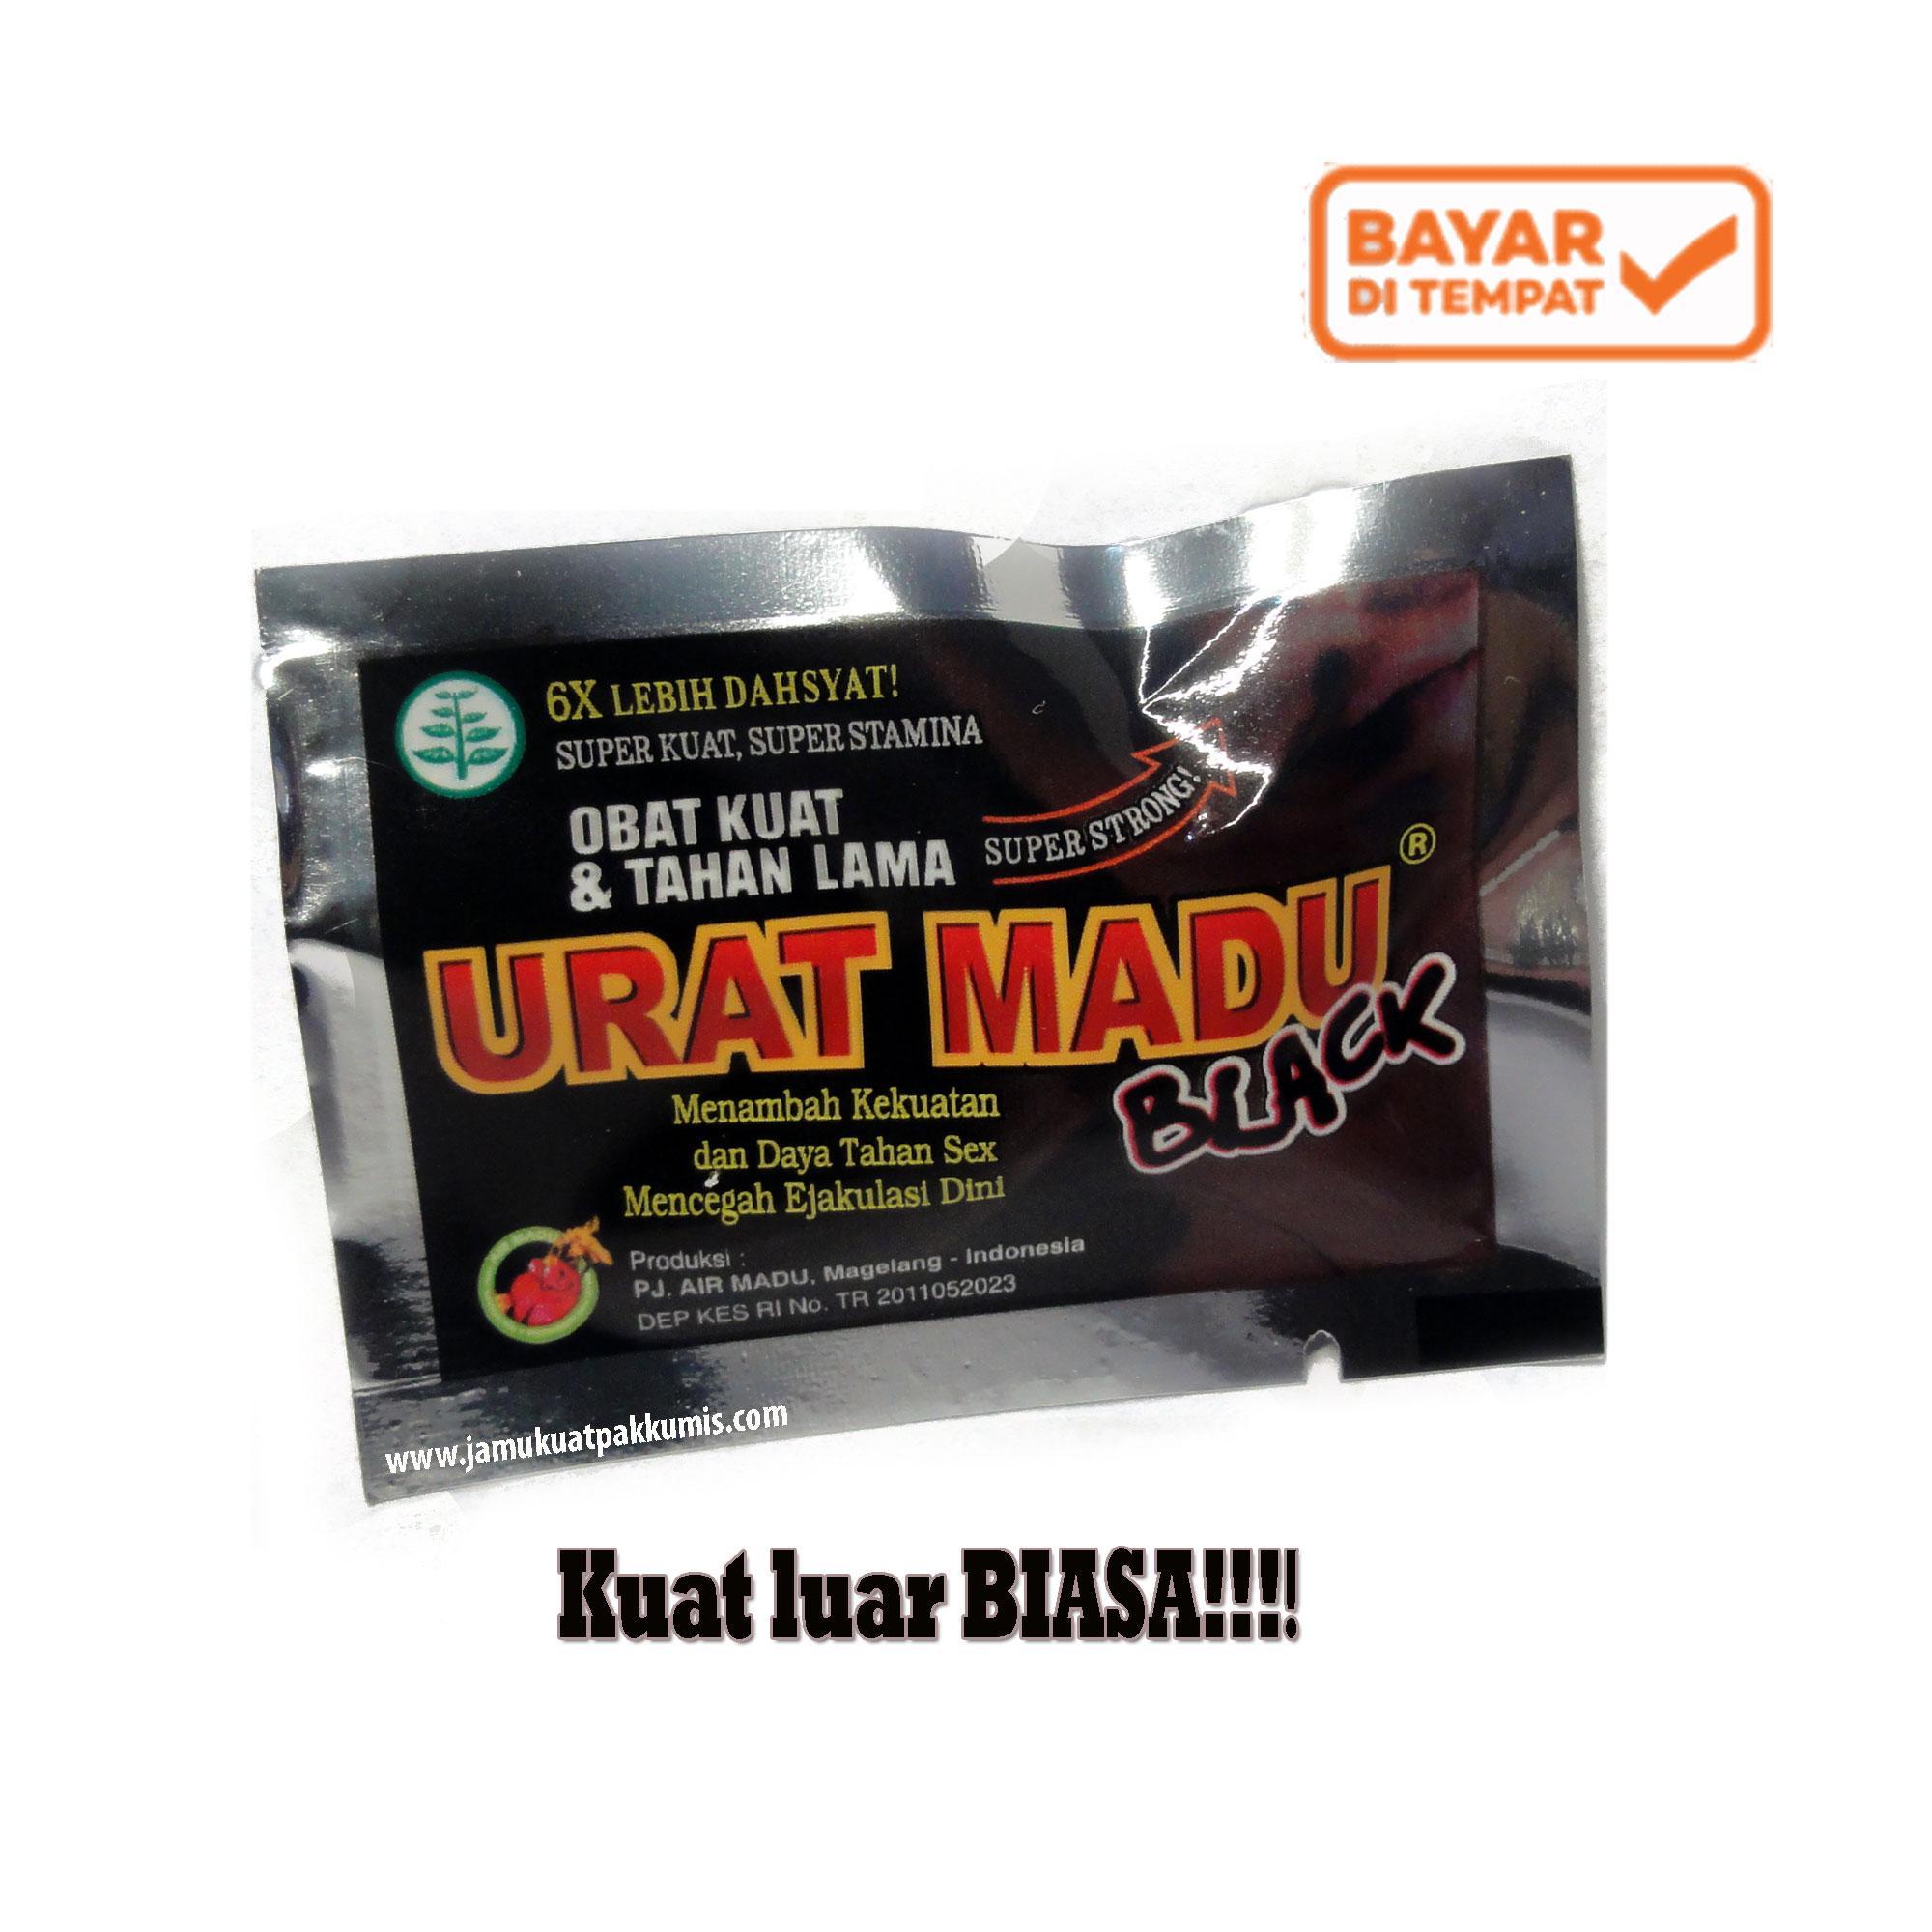 Kapsul URAT MADU BLACK Jamu Kuat Lelaki 6x Lebih dahsat !! - 1 Sachet ( 480f05105a